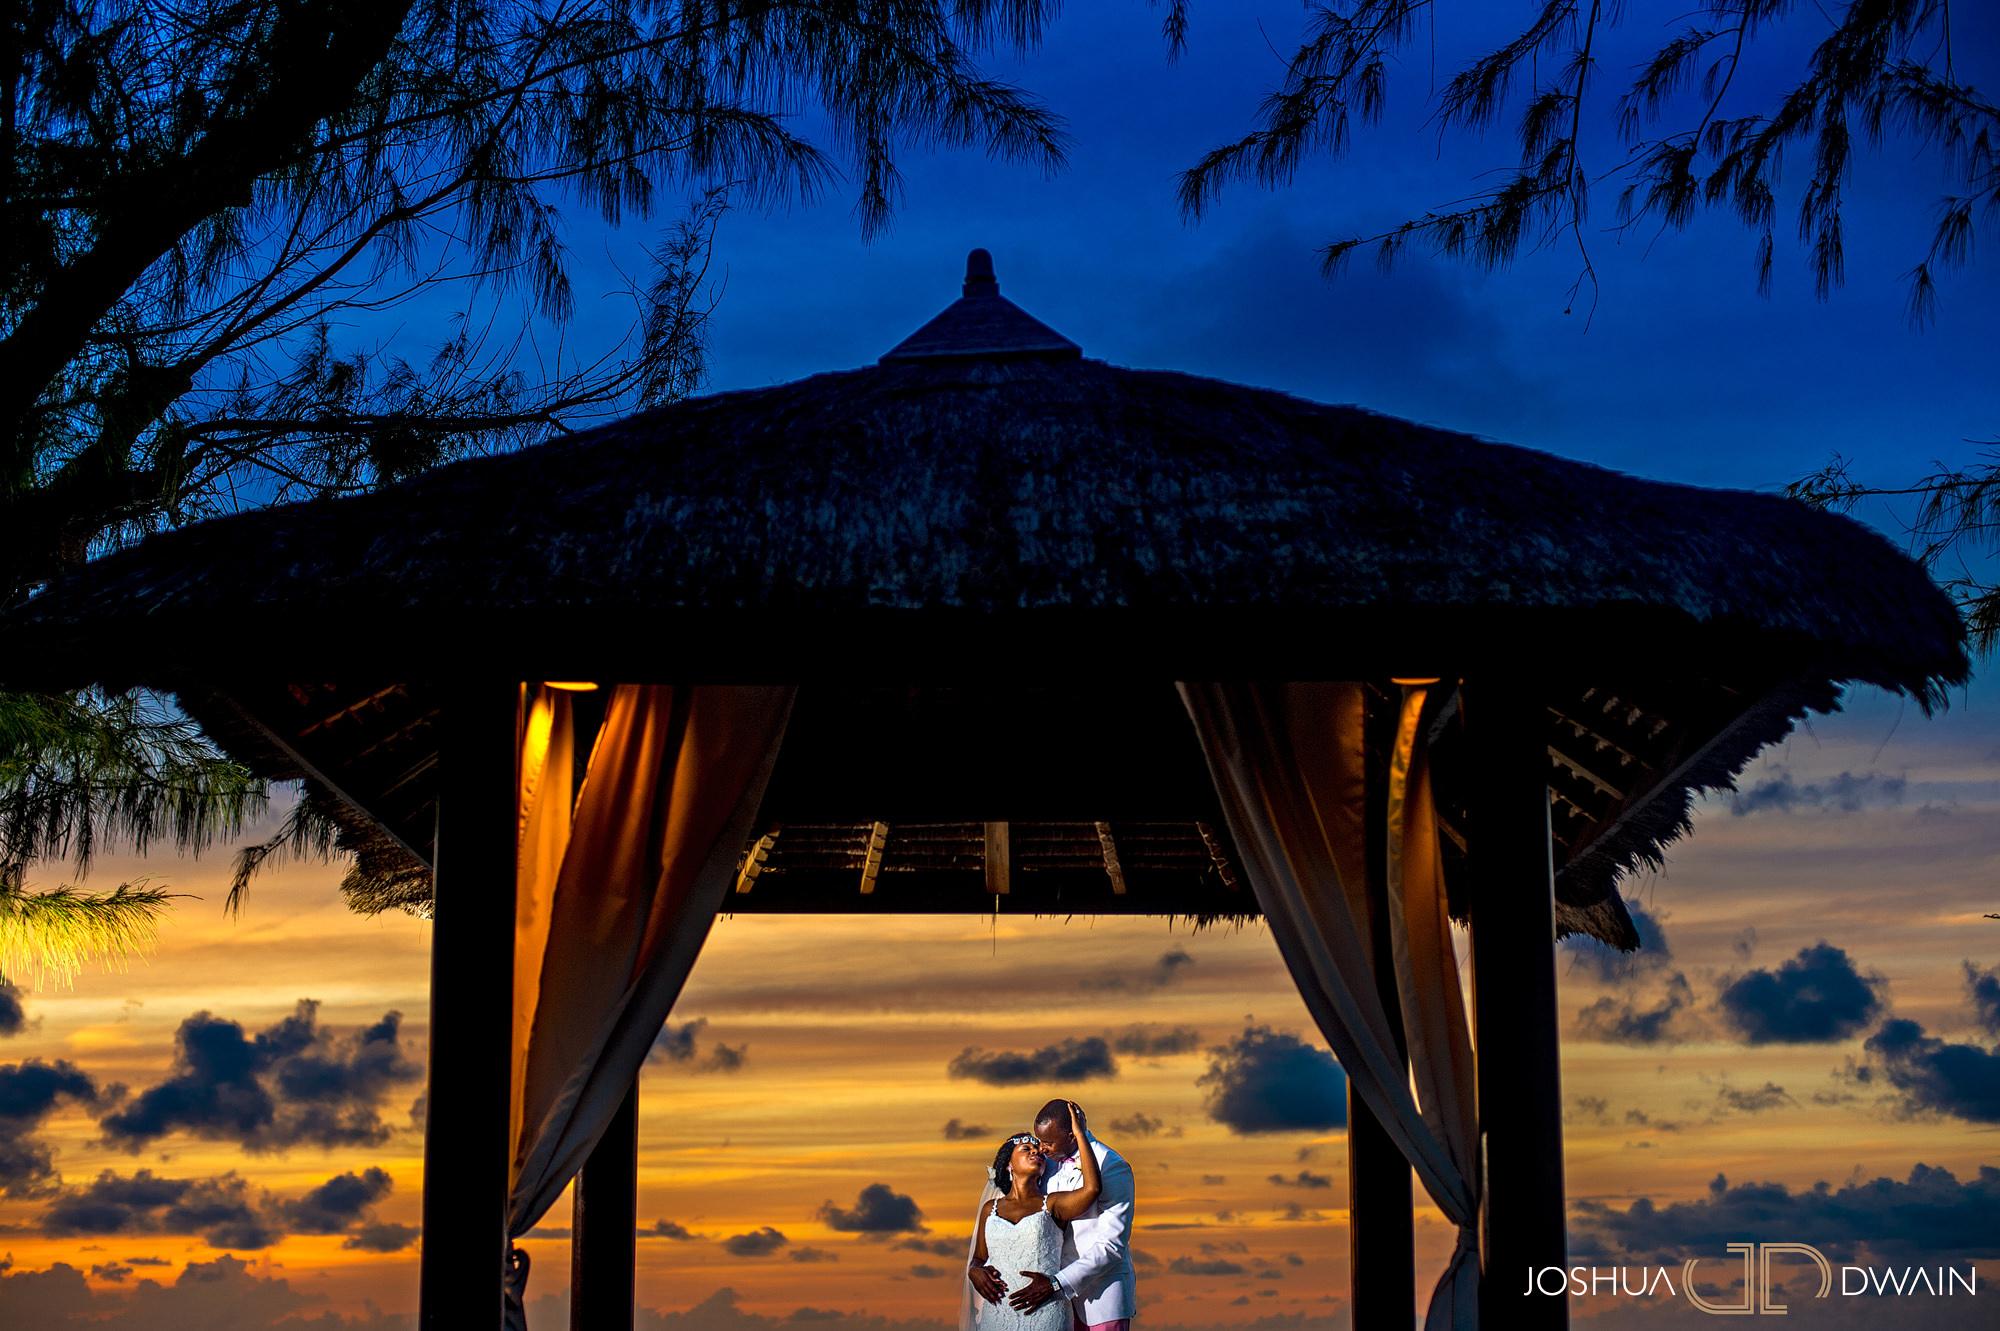 joshua-dwain-weddings-gallery-best-wedding-photographers-us-022